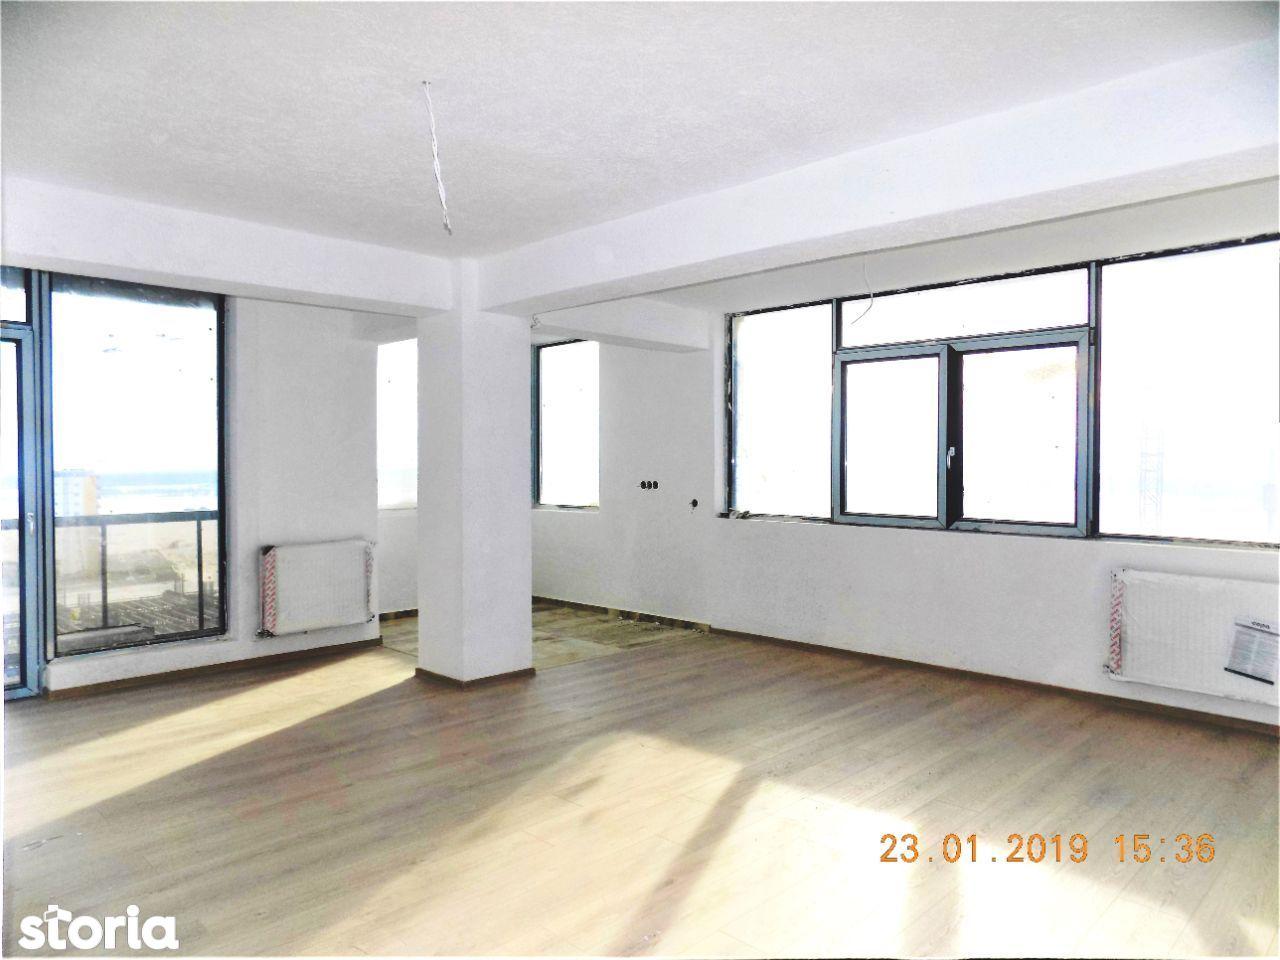 Apartament 3 camere 88 mp finisat si intabulat. Cosmopolitan Residence